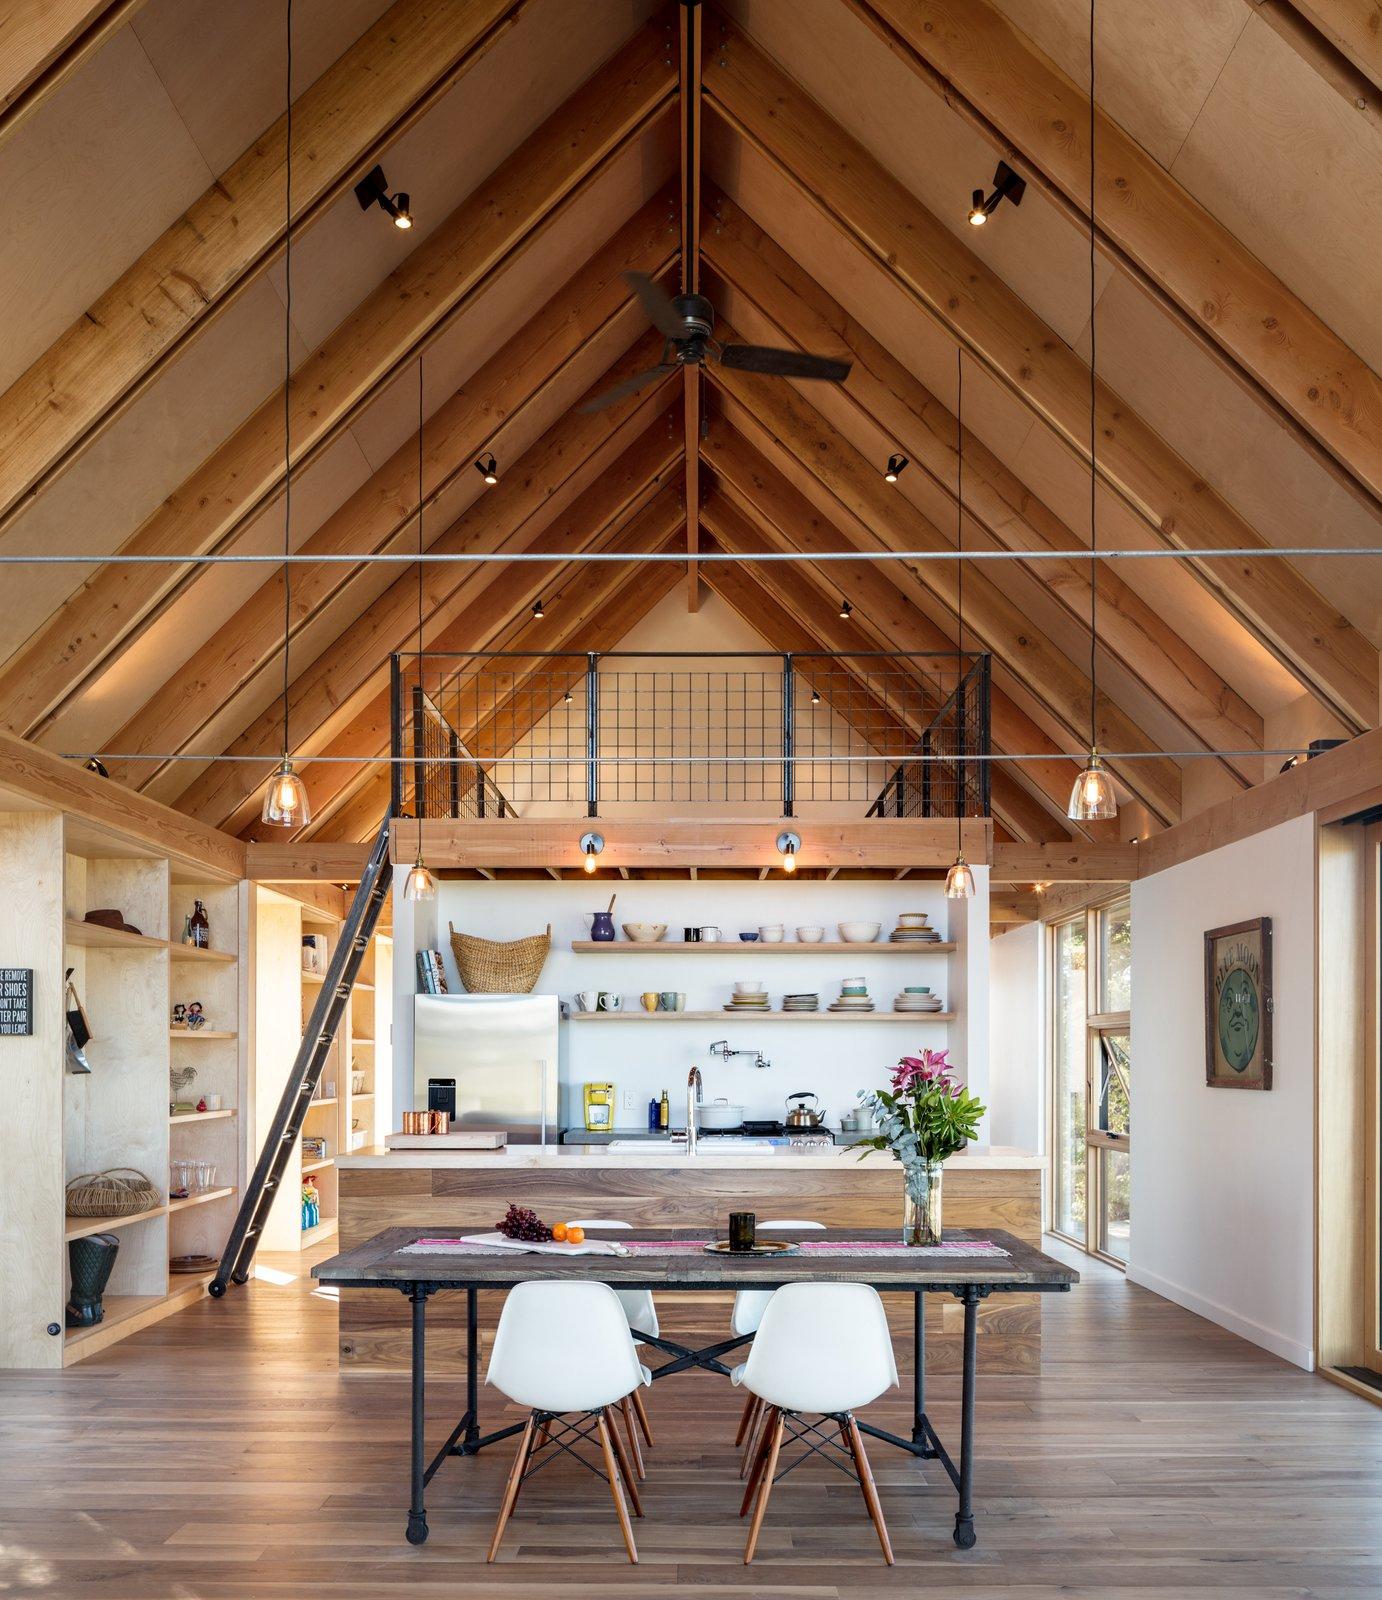 Dining Room, Chair, Pendant Lighting, Medium Hardwood Floor, Shelves, Table, and Ceiling Lighting  Big Cabin | Little Cabin by Renée del Gaudio Architecture